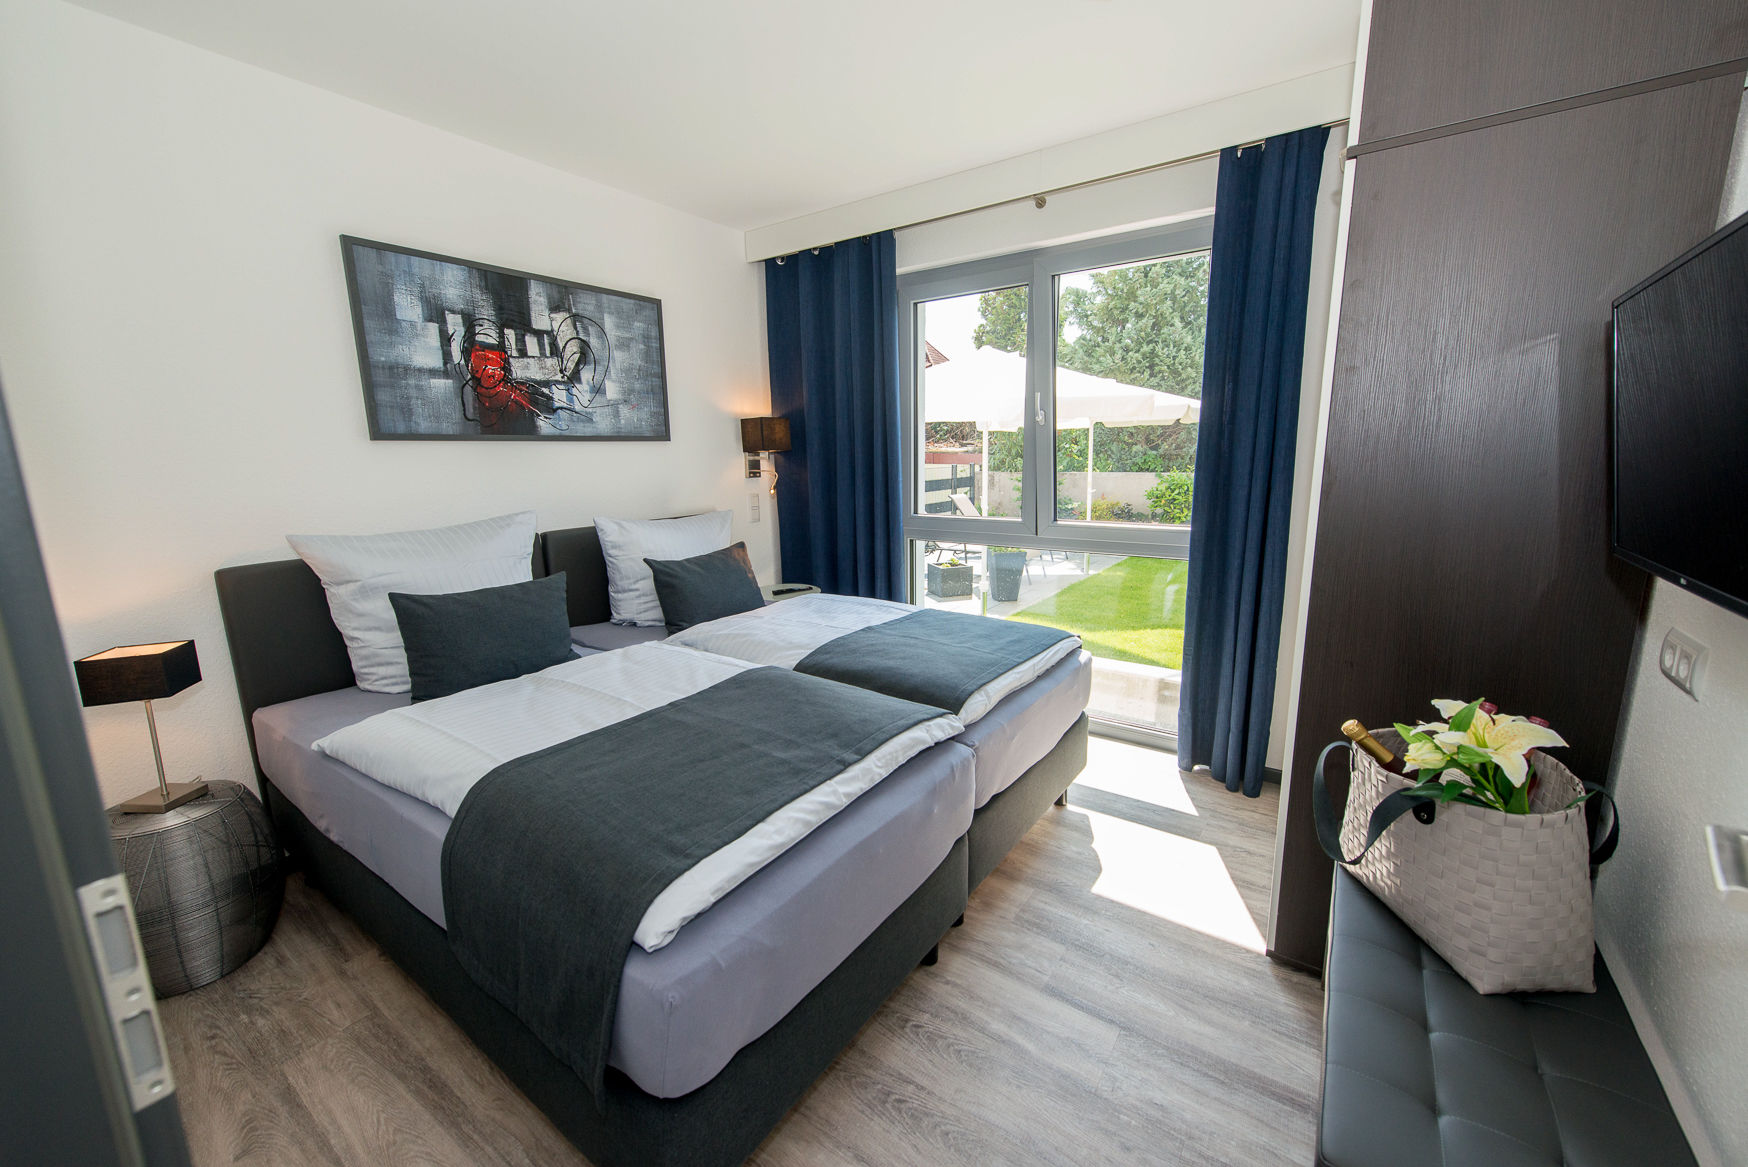 apartmenthaus horster gro e komfort ferienwohnungen in bensheim hessen ulrike horster. Black Bedroom Furniture Sets. Home Design Ideas